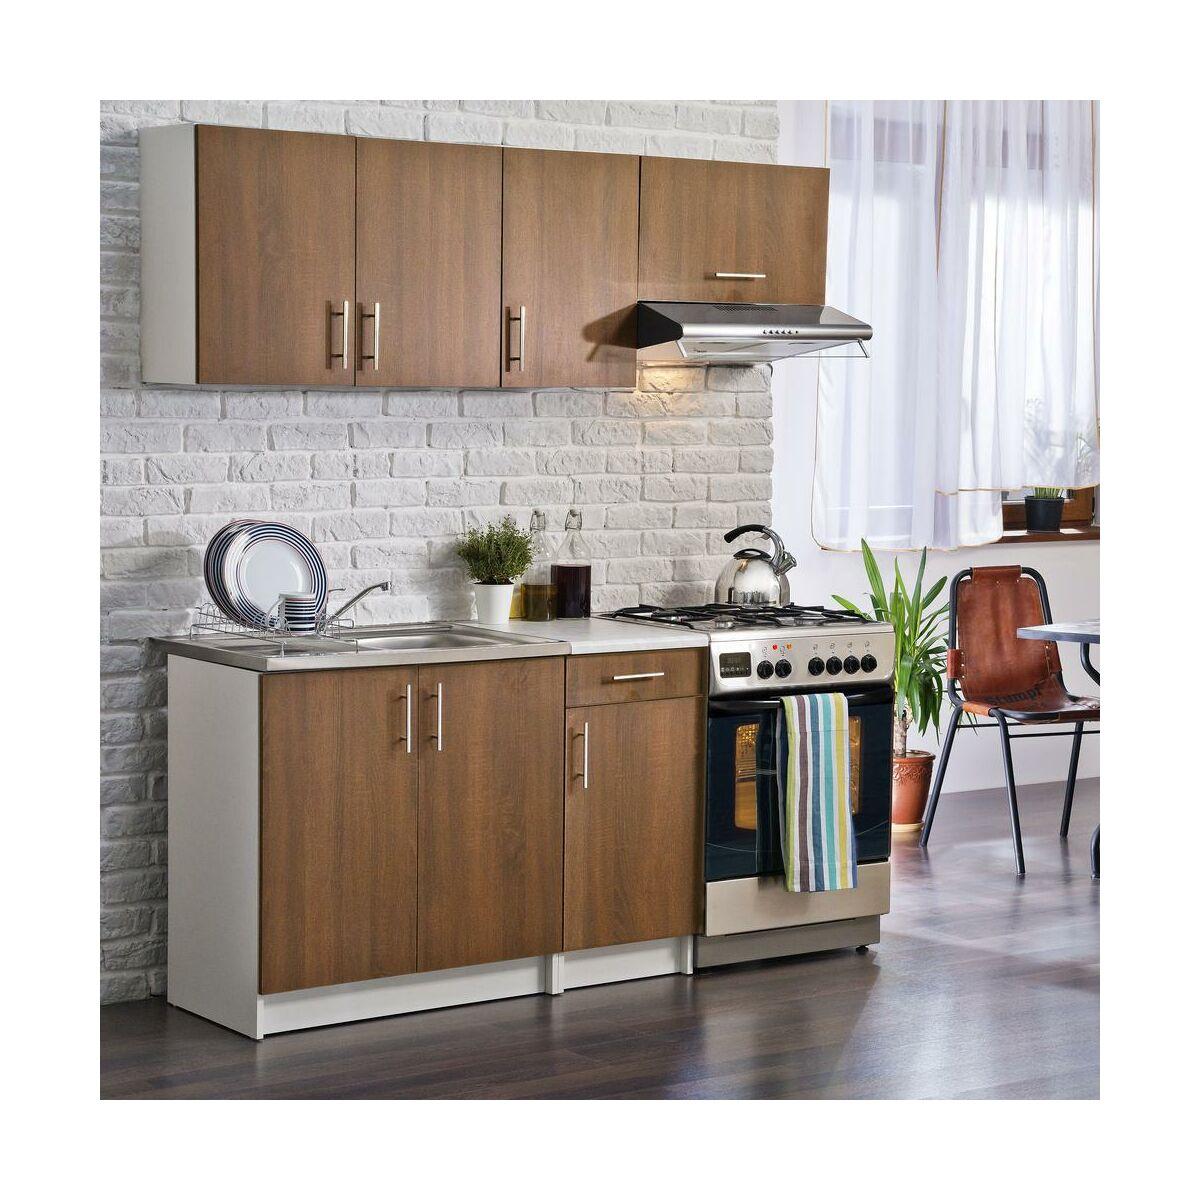 Zestaw mebli kuchennych TOLA 2 DEFTRANS  Meble kuchenne w zestawach  w atra   -> Leroy Merlin Kuchnia Tola